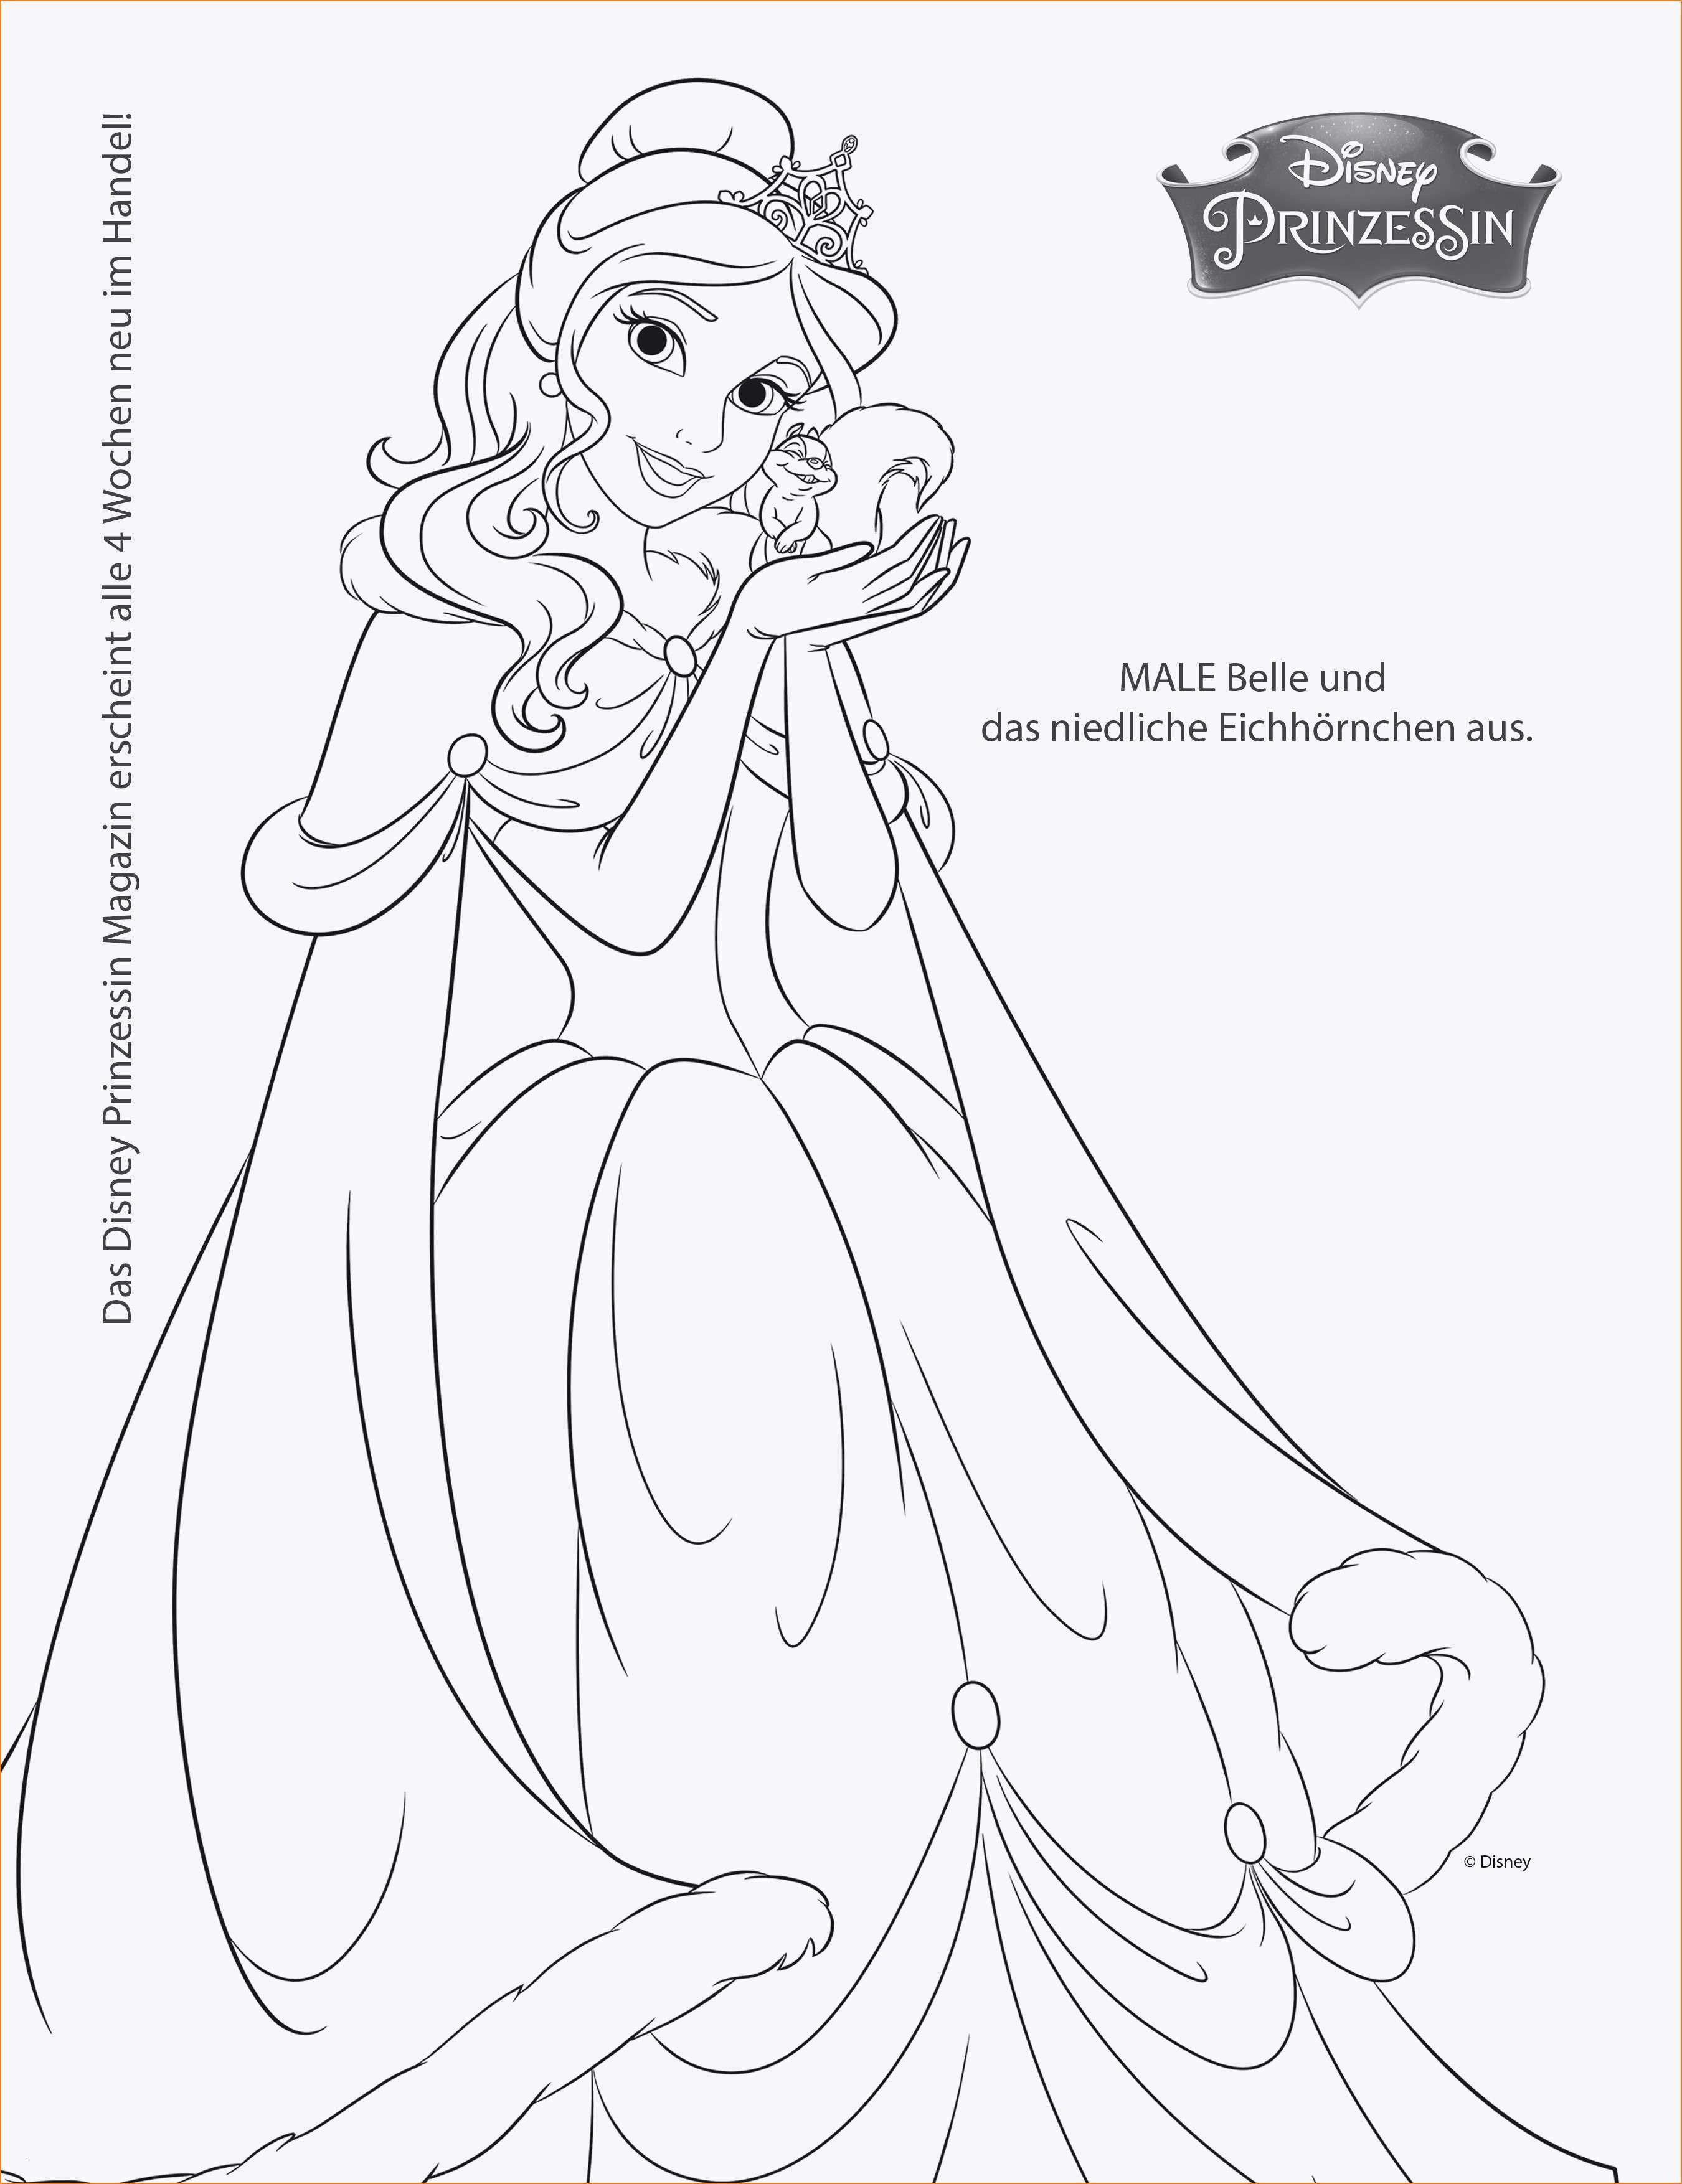 Pj Mask Ausmalbild Neu Ausmalbilder Pj Masks Inspirierend 12 Owlette Coloring Page Schön Pj Fotos